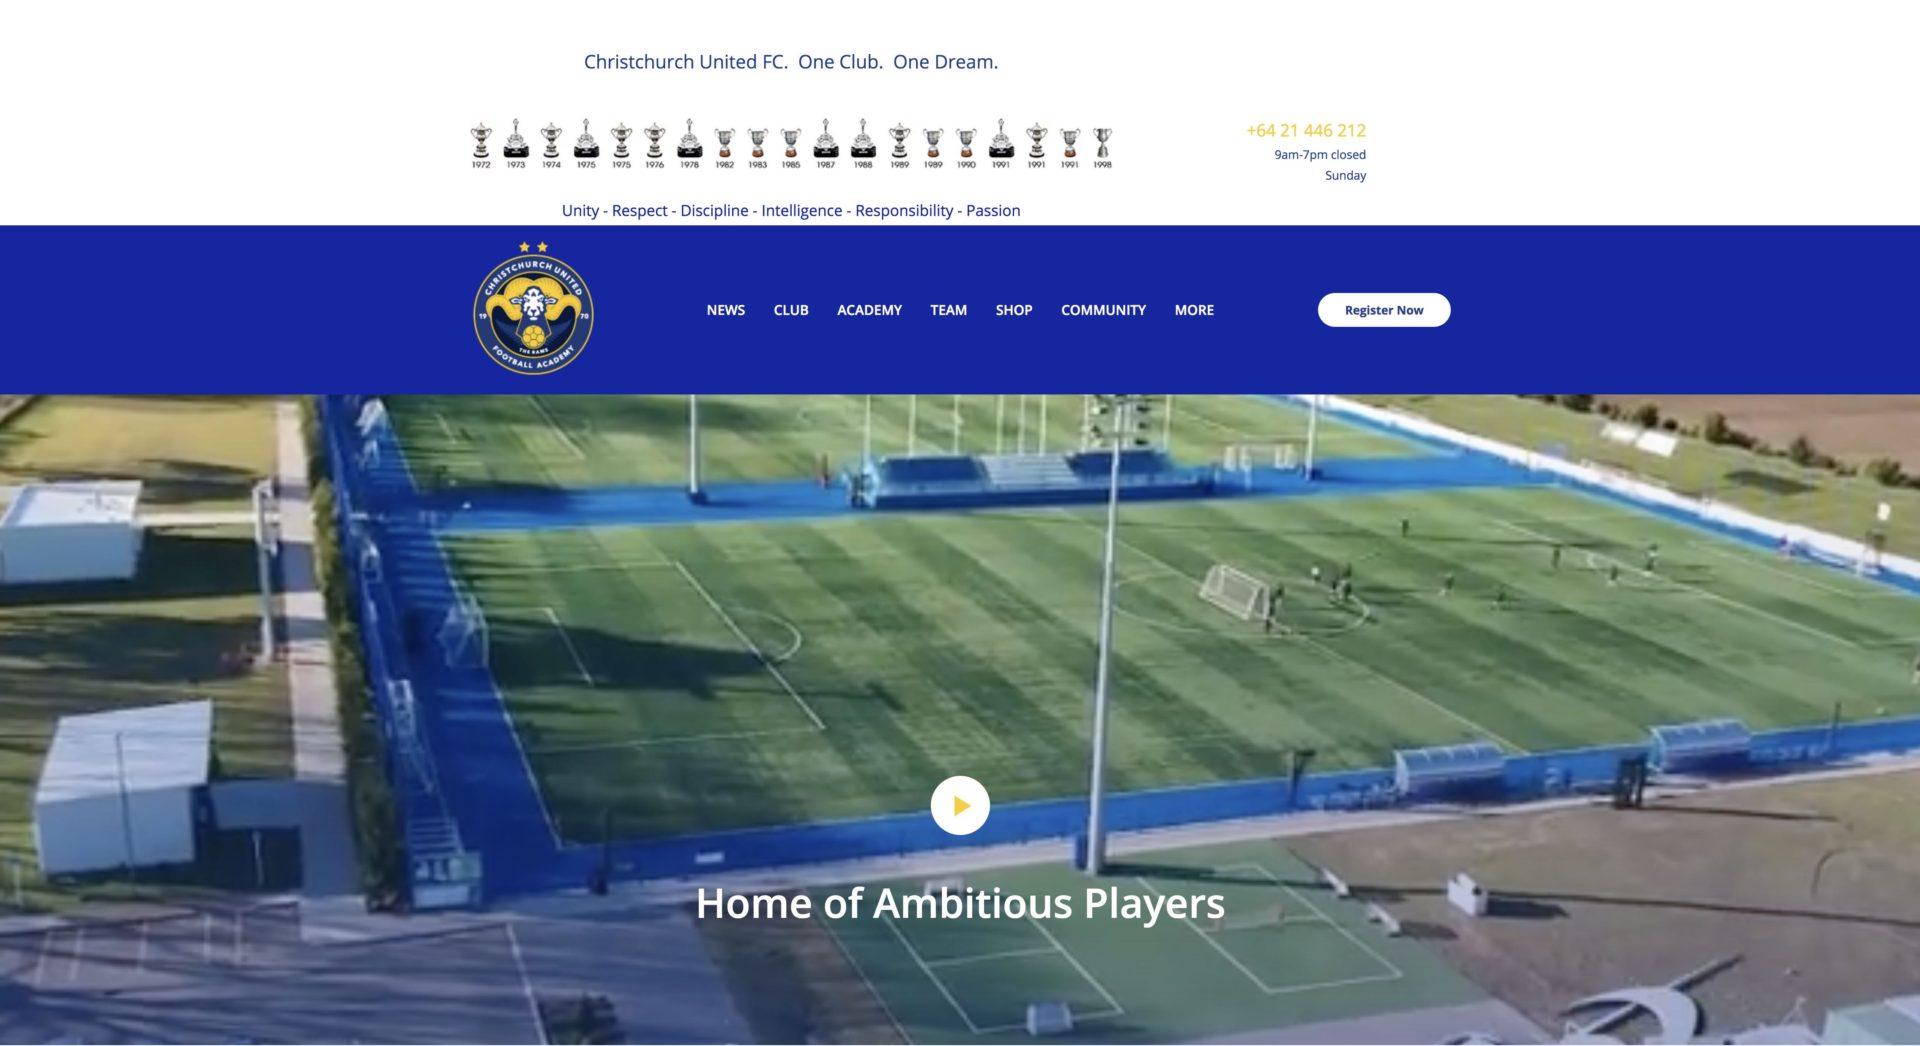 Christchurch United Football Club CUFC New Zealand website design and development main hero is a video